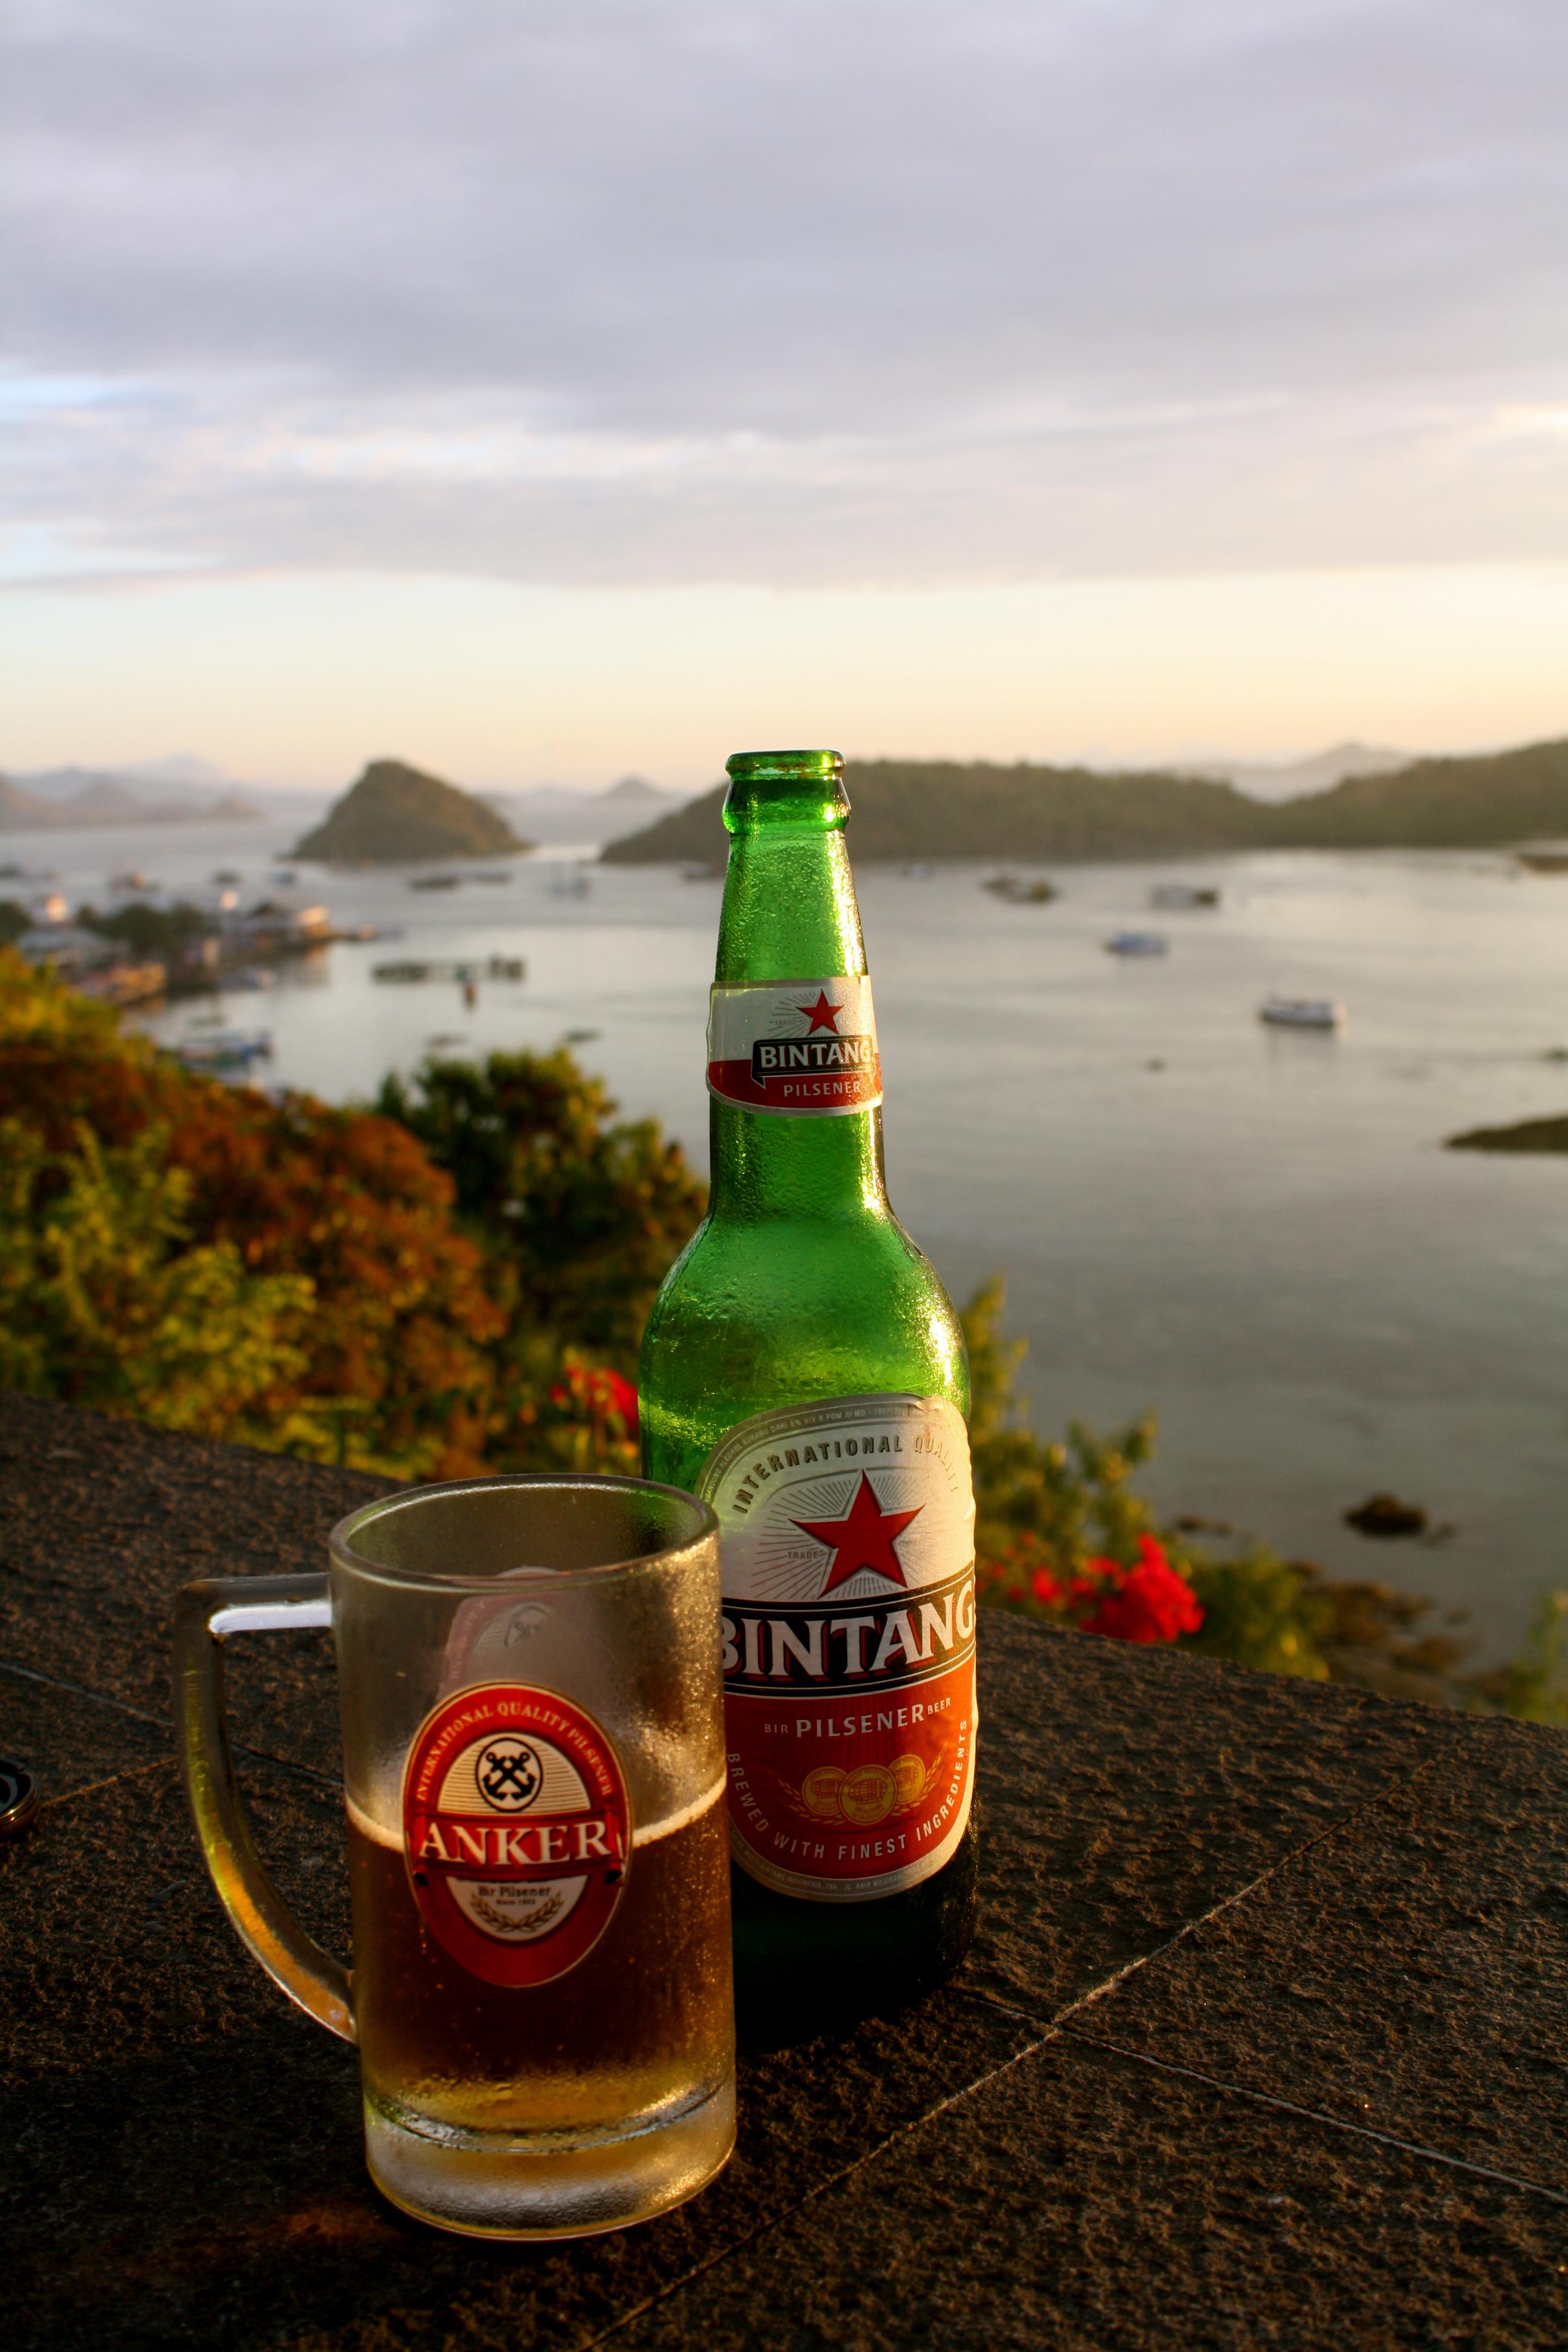 Bintang Beer Usa Beer Bintang And The Port of